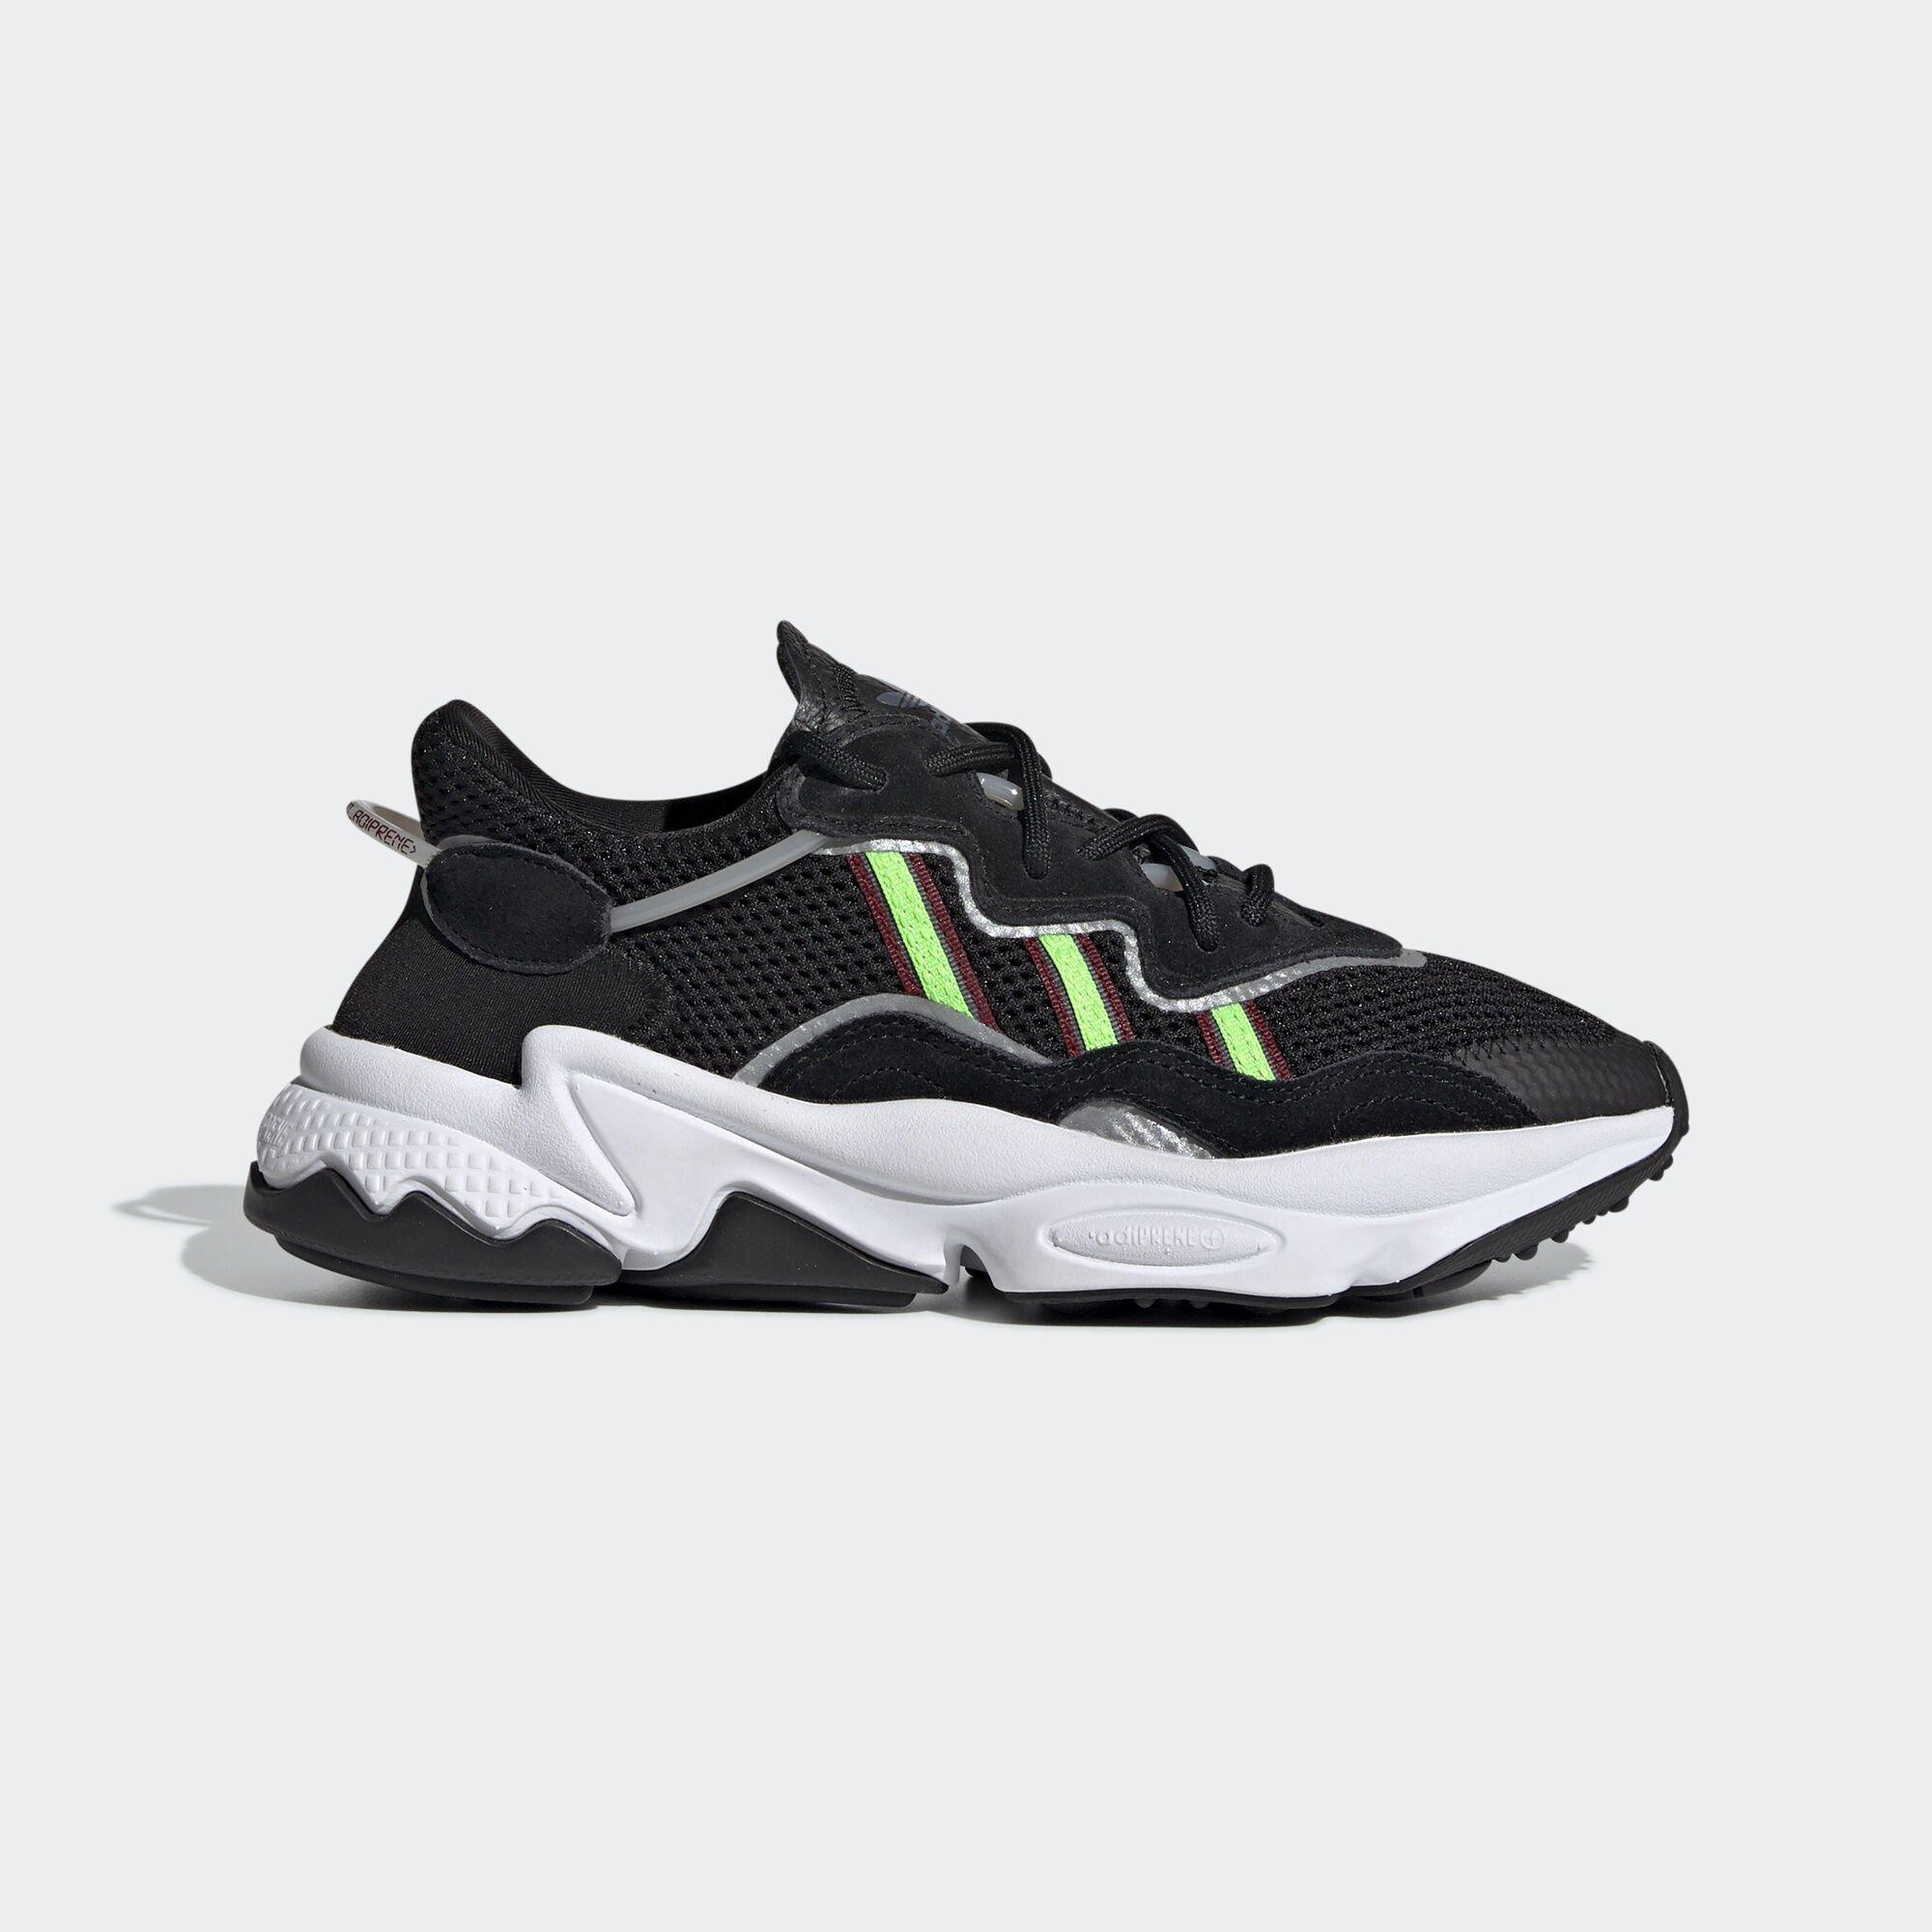 adidas Ozweego Core Black Solar Green (GS) (EE7772)